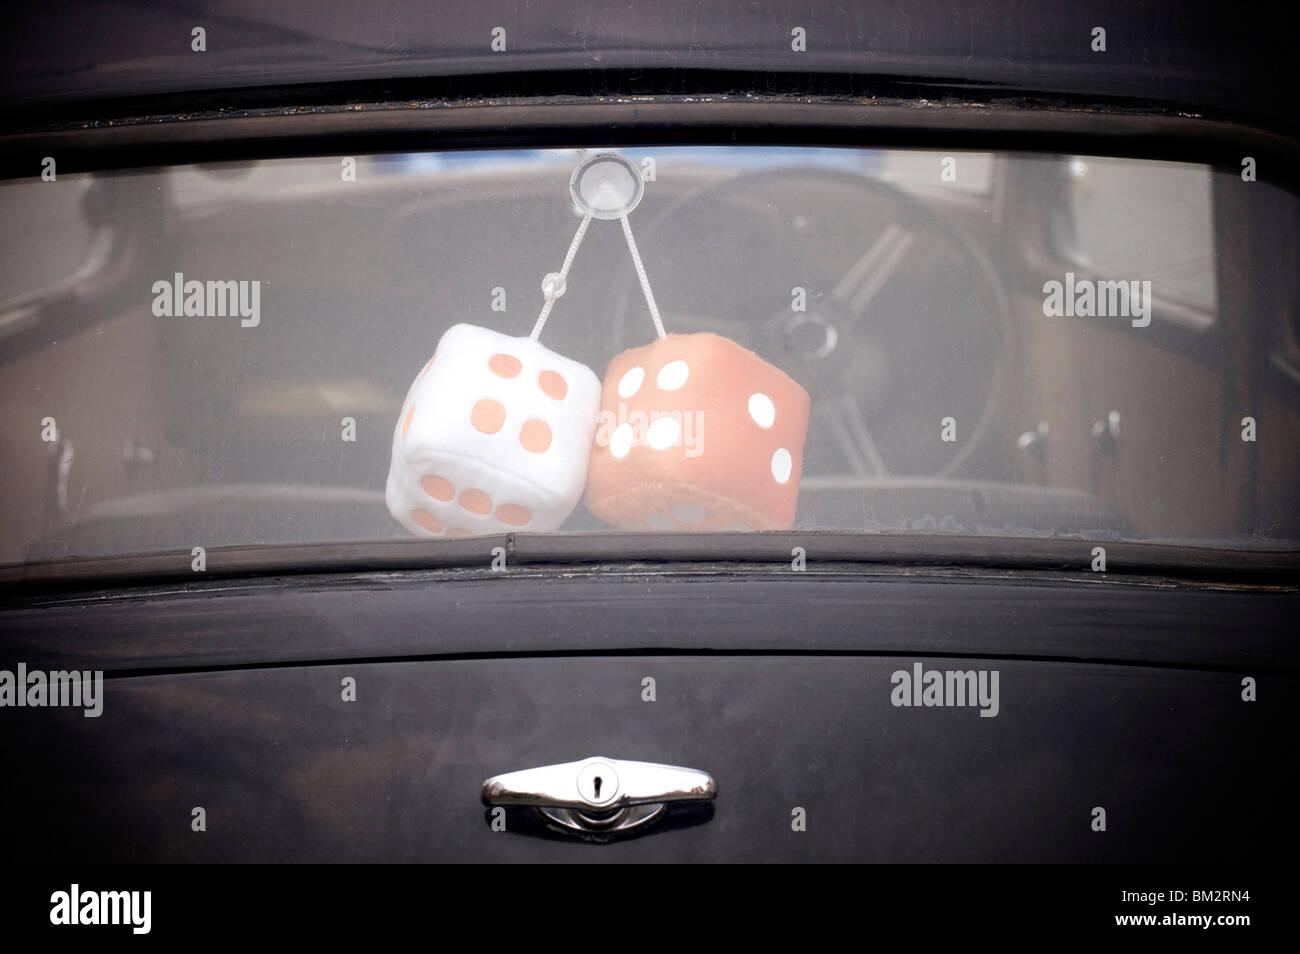 Furry dice in rear window of Austin Prefect car. - Stock Image